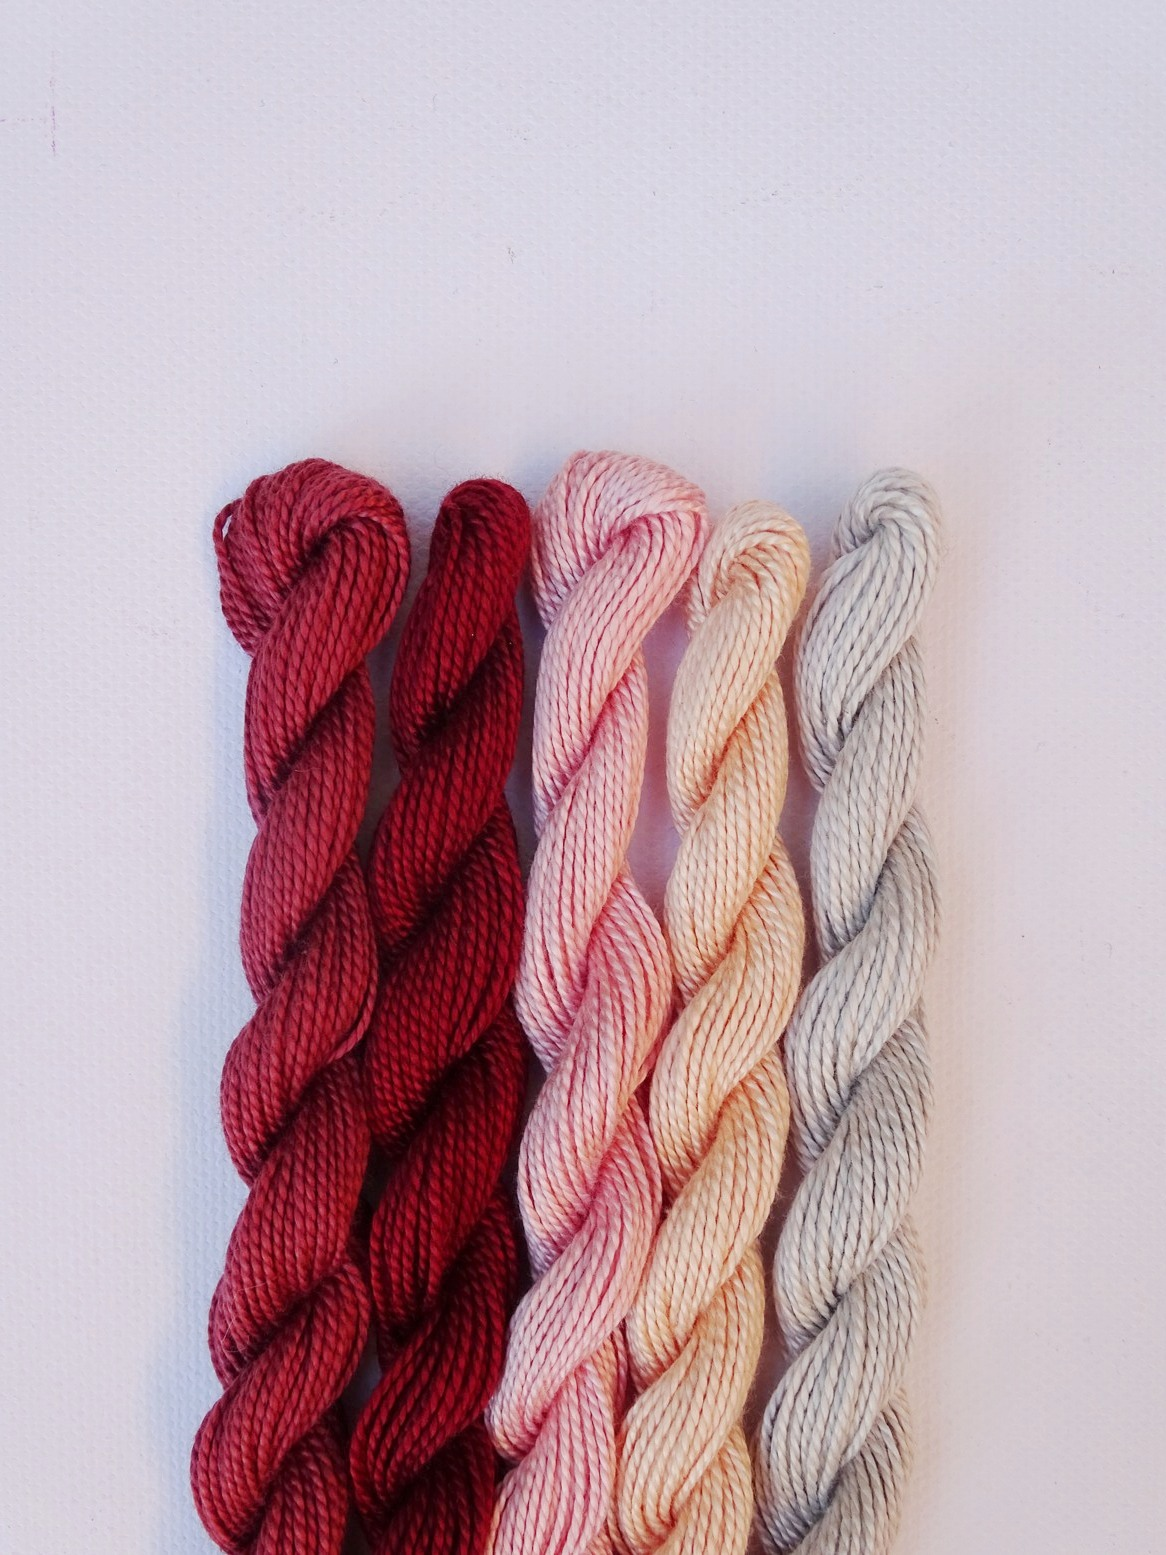 Herbstliche Farbkombination mit Rot, Mauve, Puderrosa, Champagner, Blassgrau